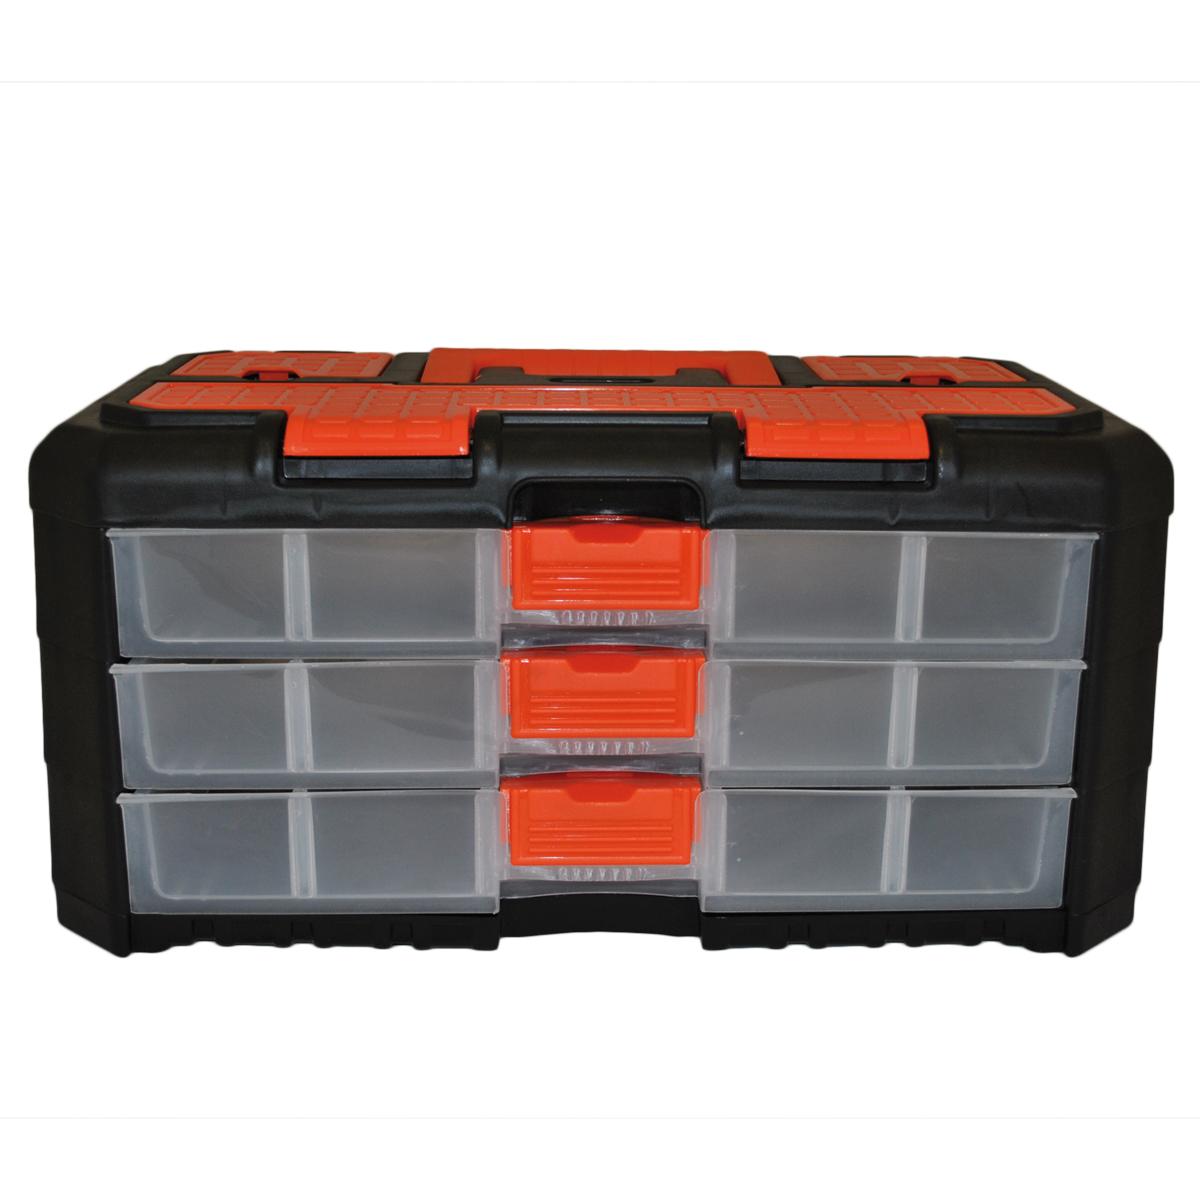 Органайзер для мелочей Blocker Grand, цвет: черный, оранжевый, 400 х 219 х 197 мм цена